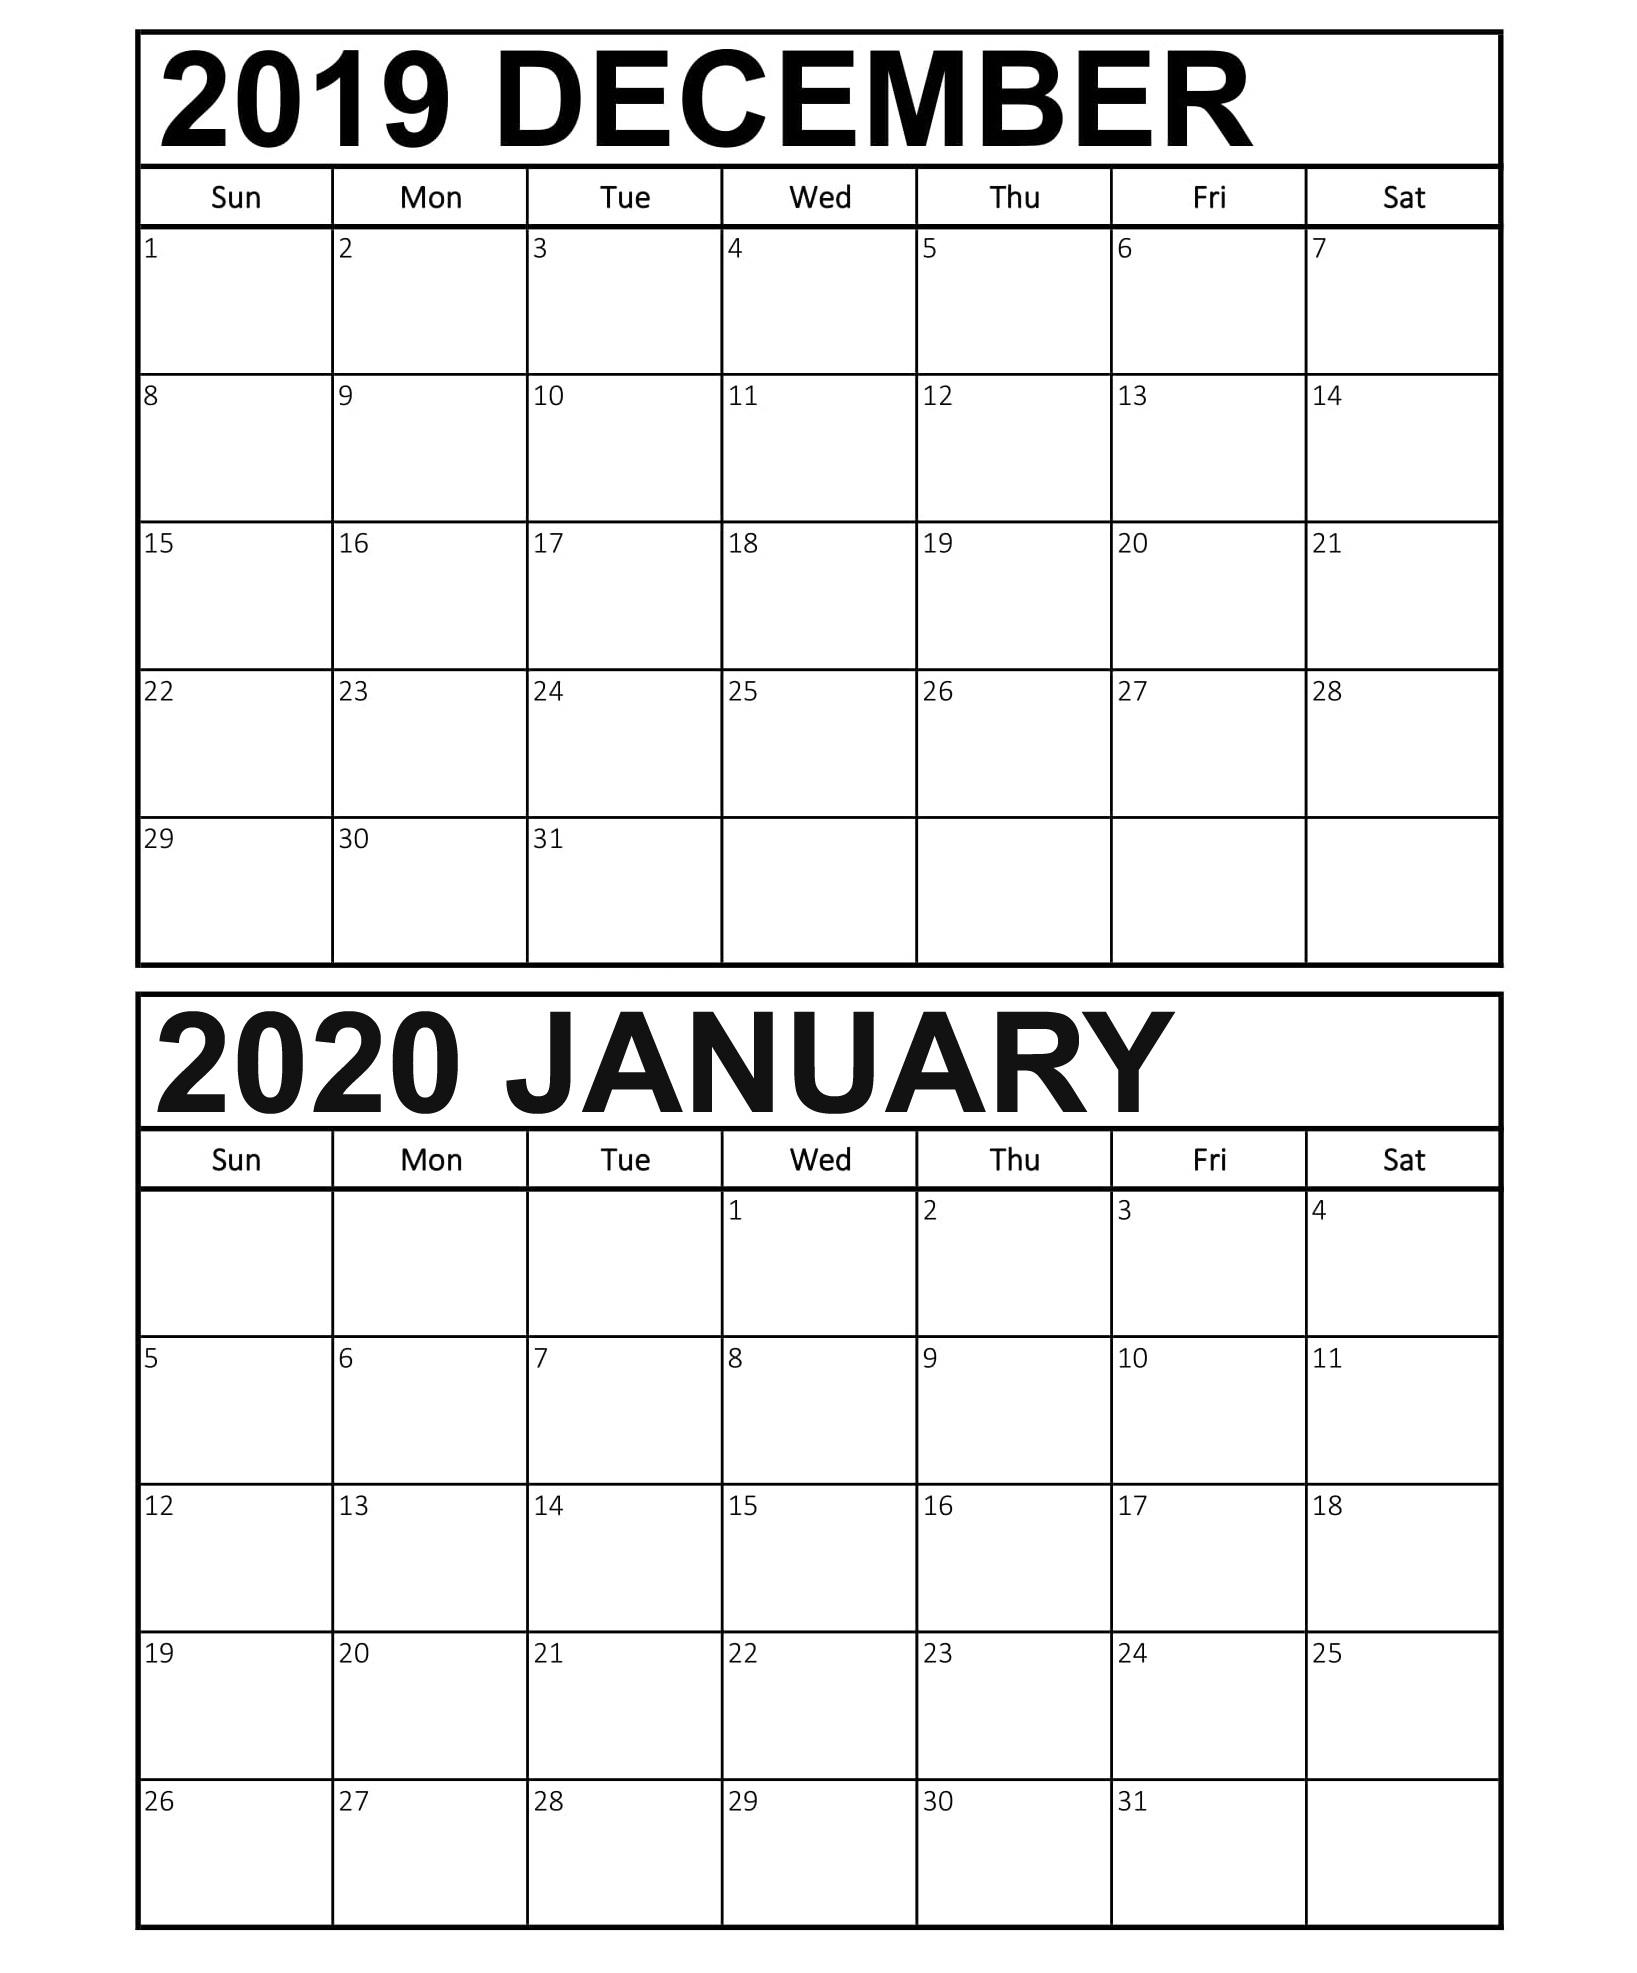 Calendar December 2019 January 2020 Template - 2019